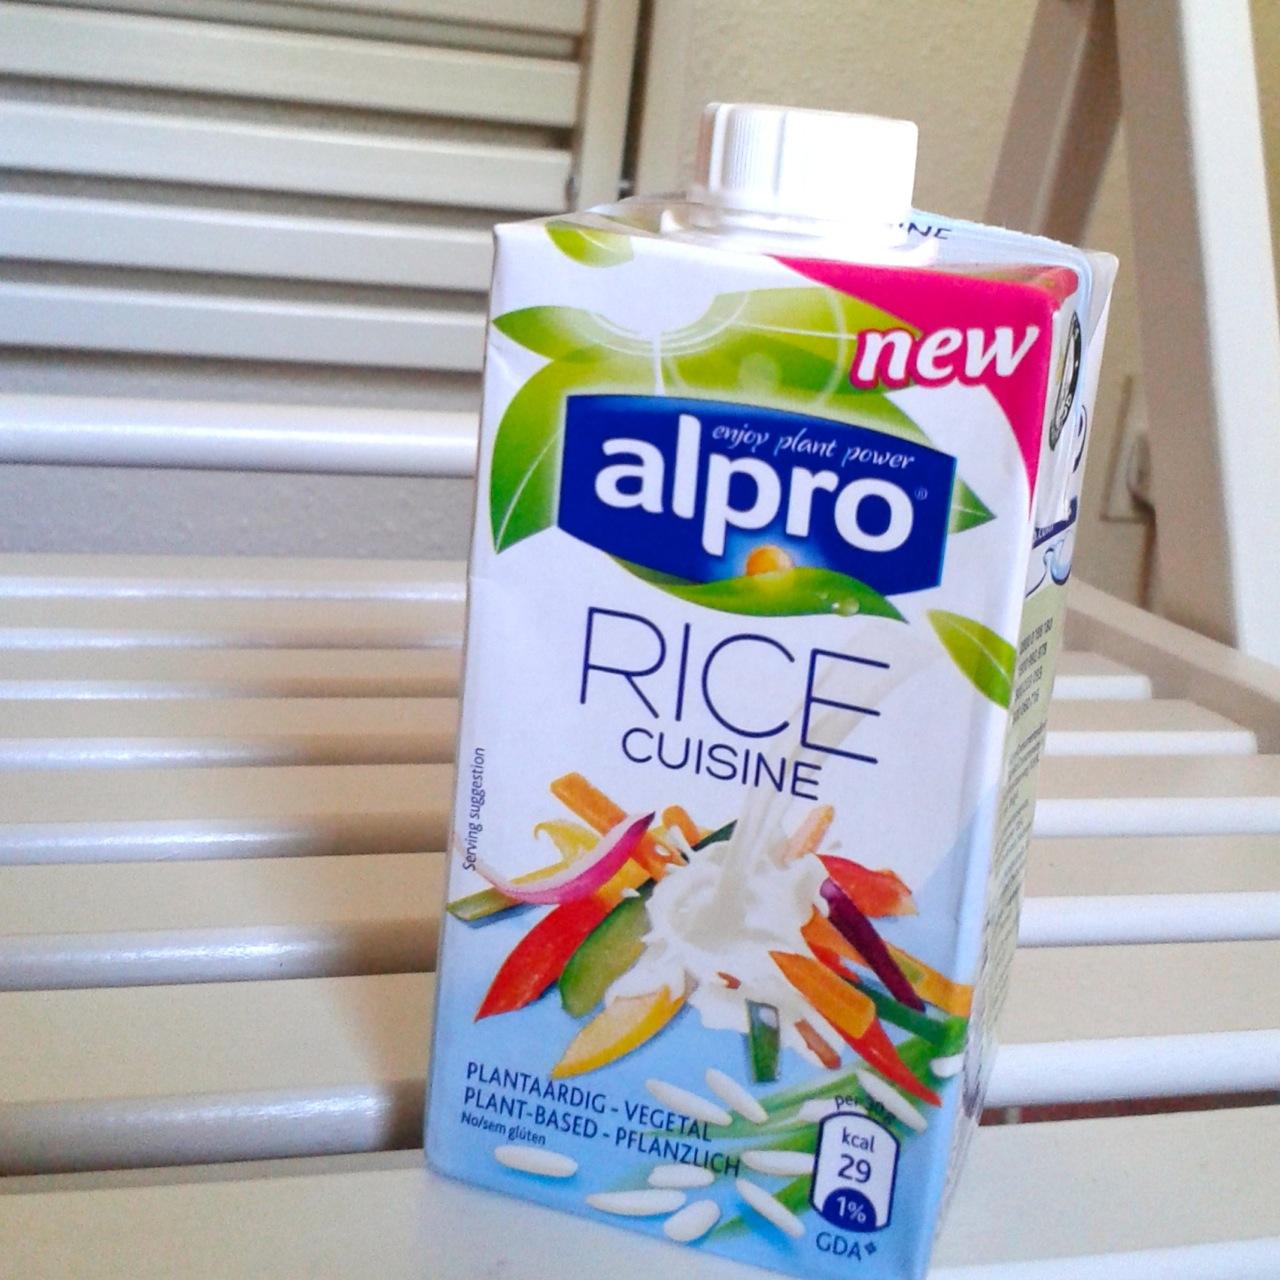 https://i2.wp.com/fatgayvegan.com/wp-content/uploads/2014/07/rice-cream.jpg?fit=1280%2C1280